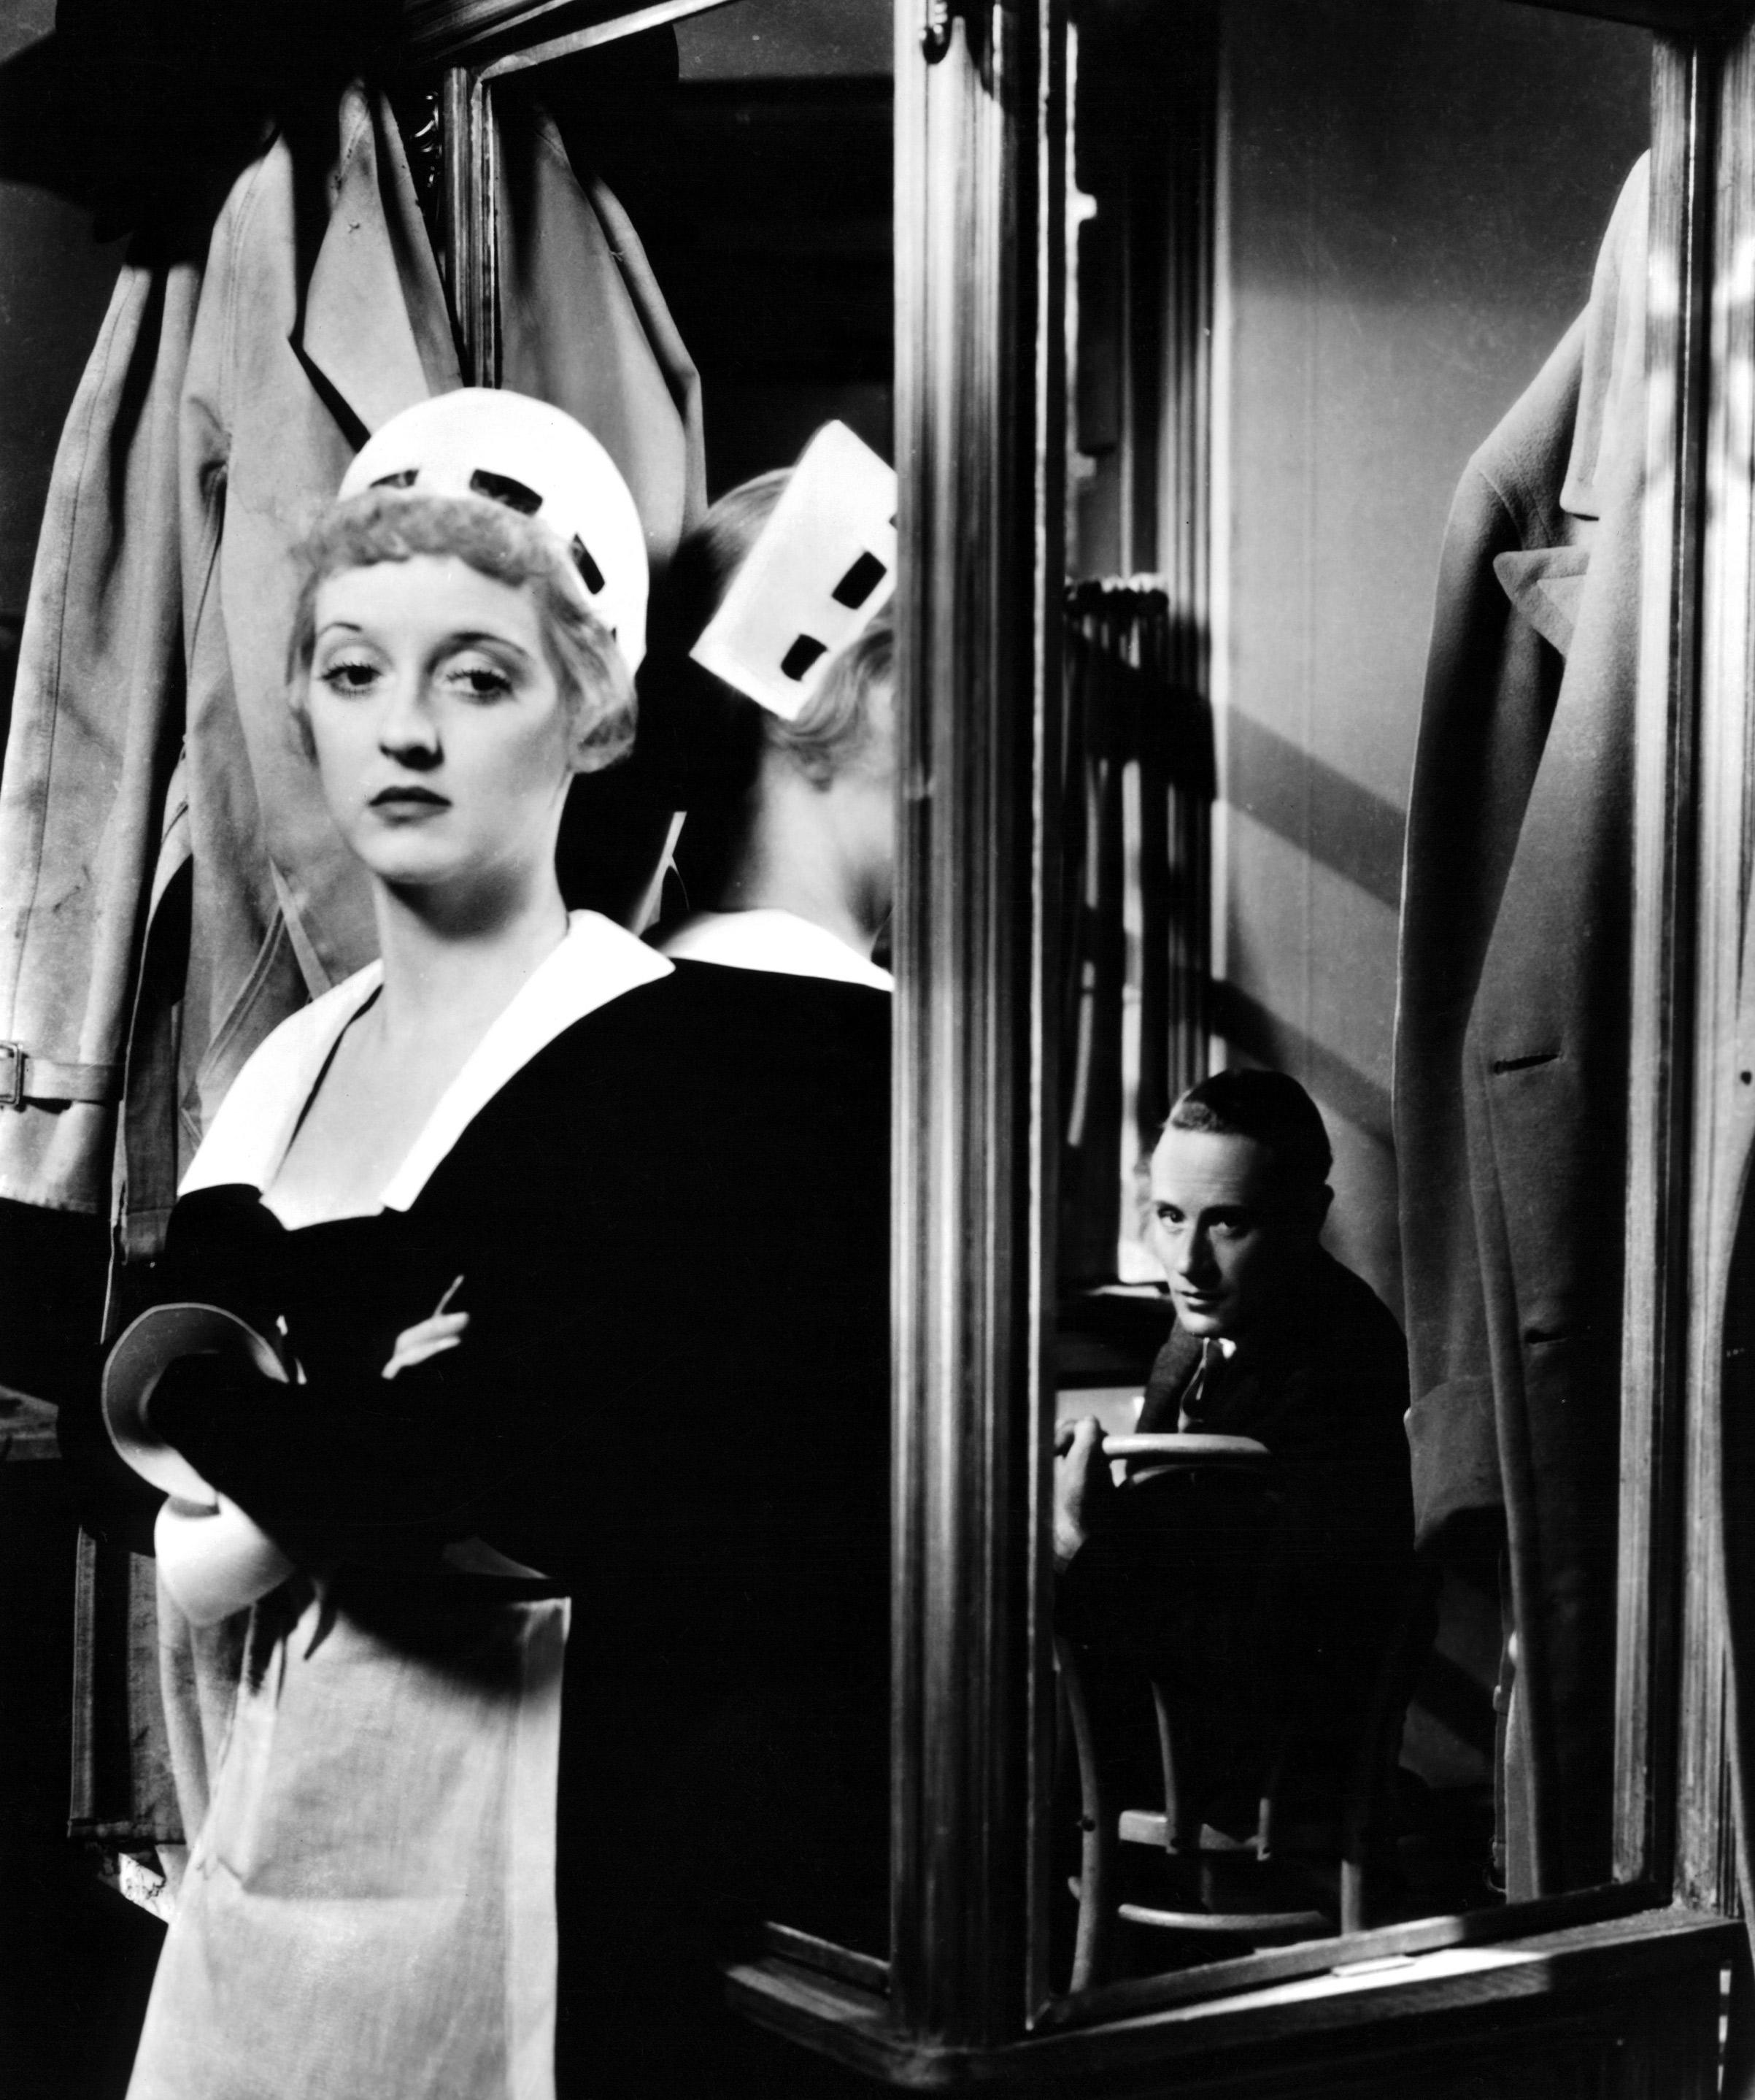 Bette Davis in a scene from the film Of Human Bondage, 1934.